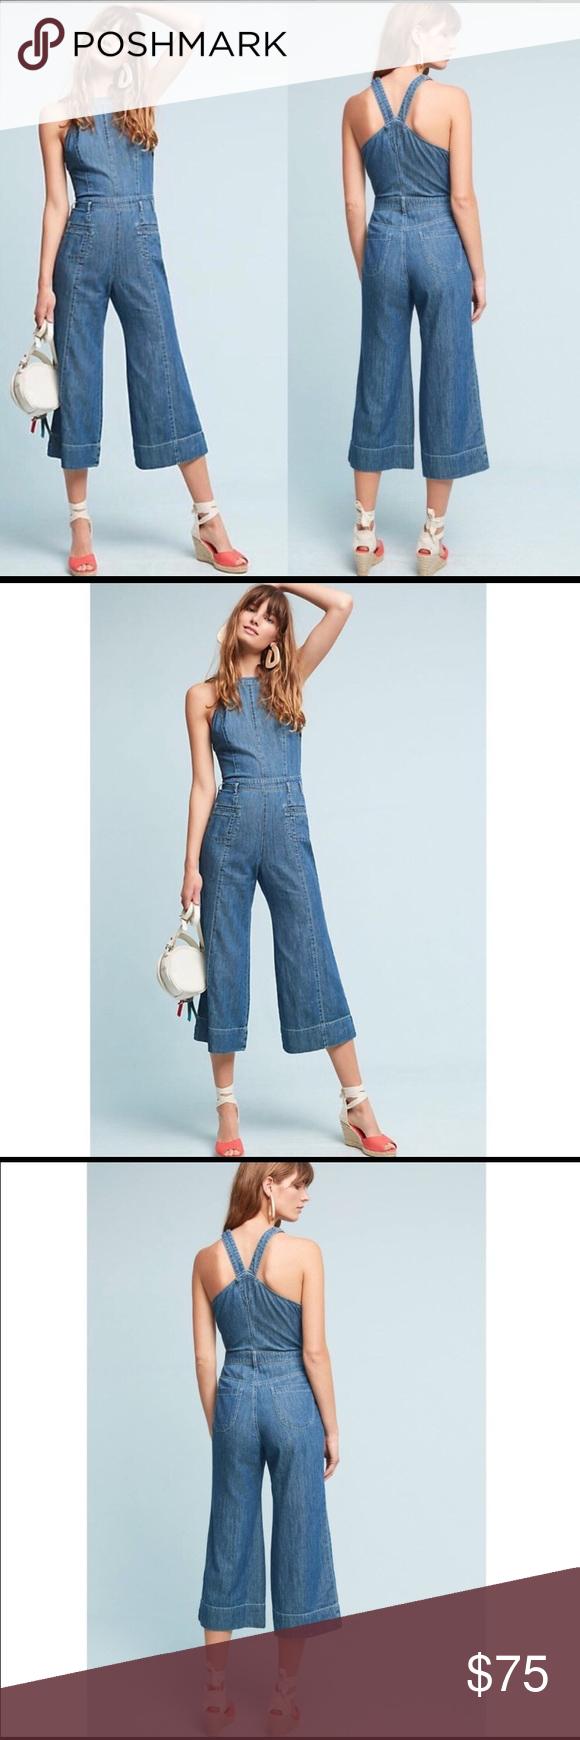 6de49bc2d54 Anthropologie Pilcro Femme Denim Jumpsuit Size 8 New without tag  Anthropologie Pants Jumpsuits   Rompers